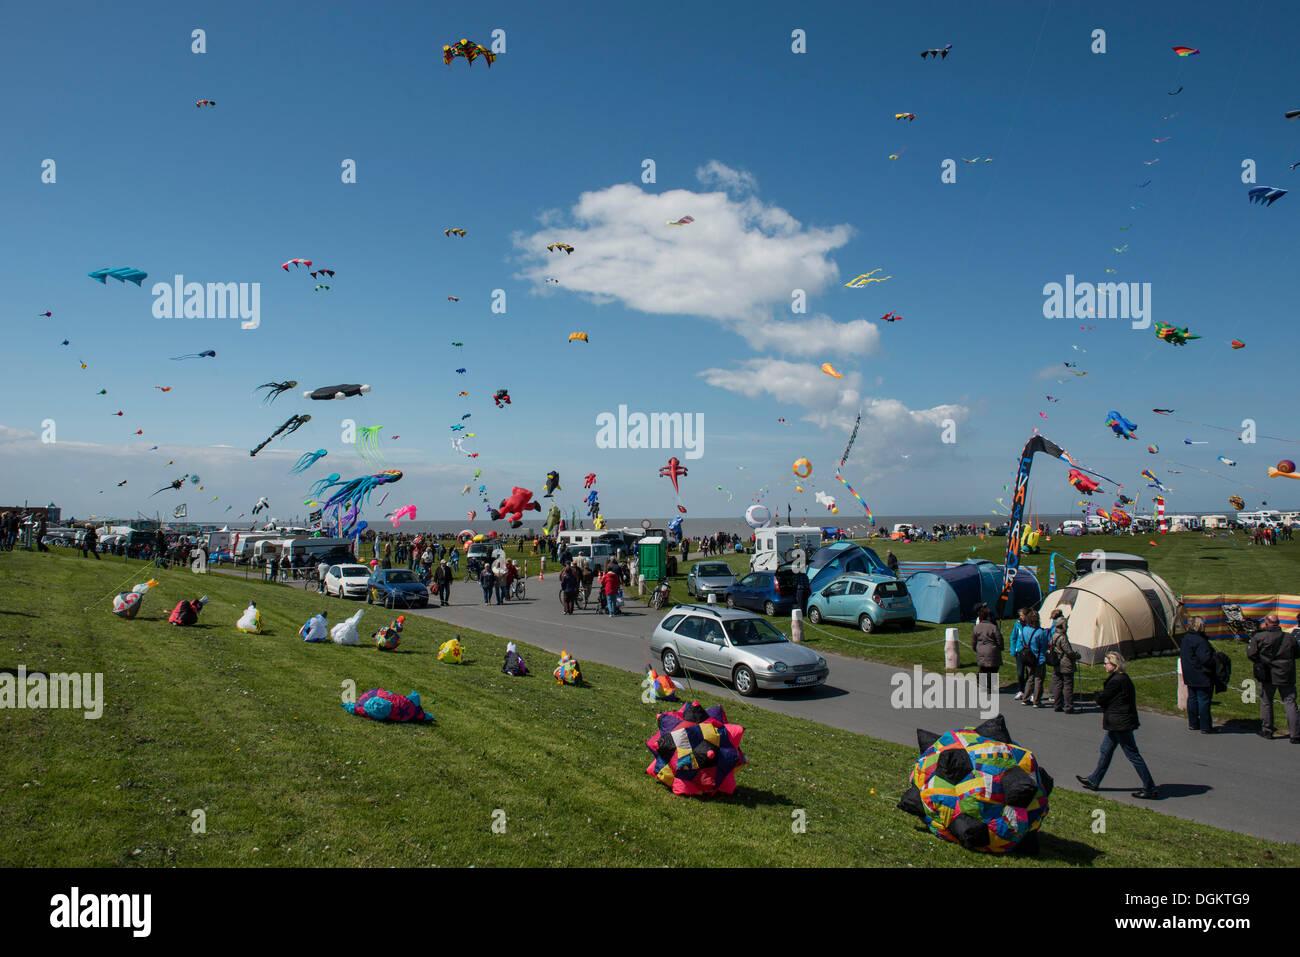 Drachenfest International kite festival, Norden, Frise orientale, Basse-Saxe Photo Stock